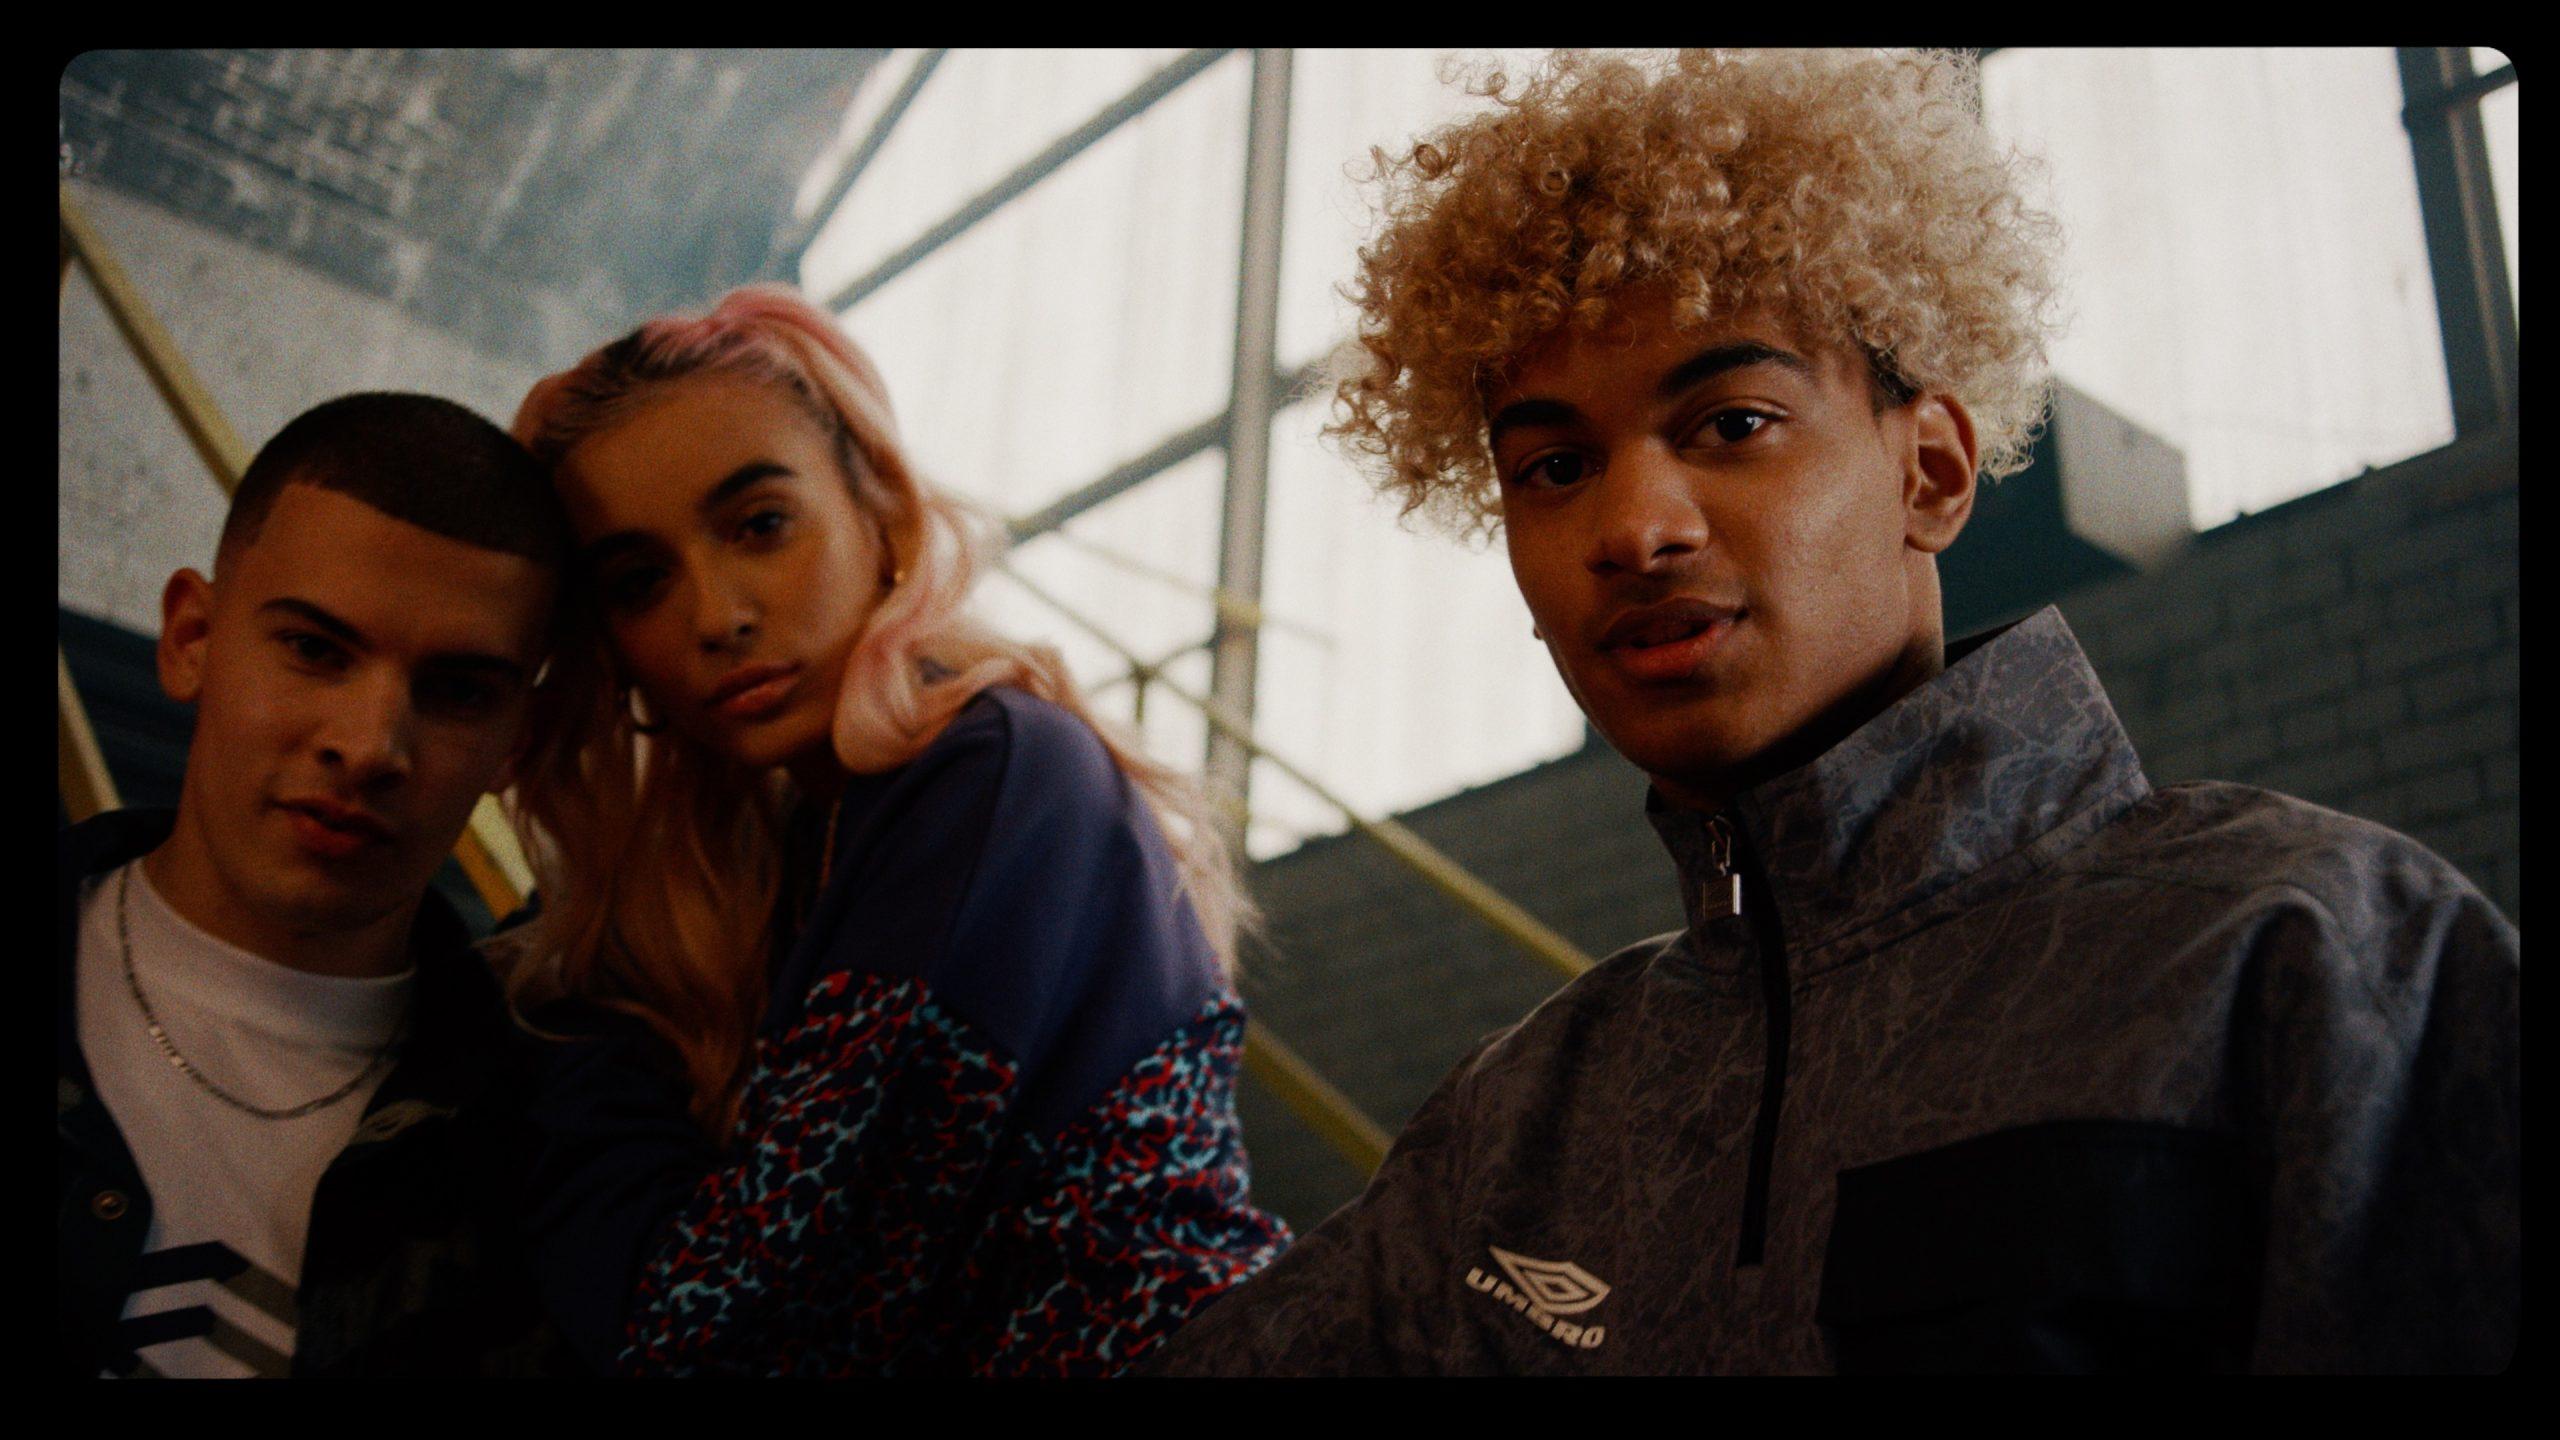 UMBRO | PROJECTS Video Production Birmingham